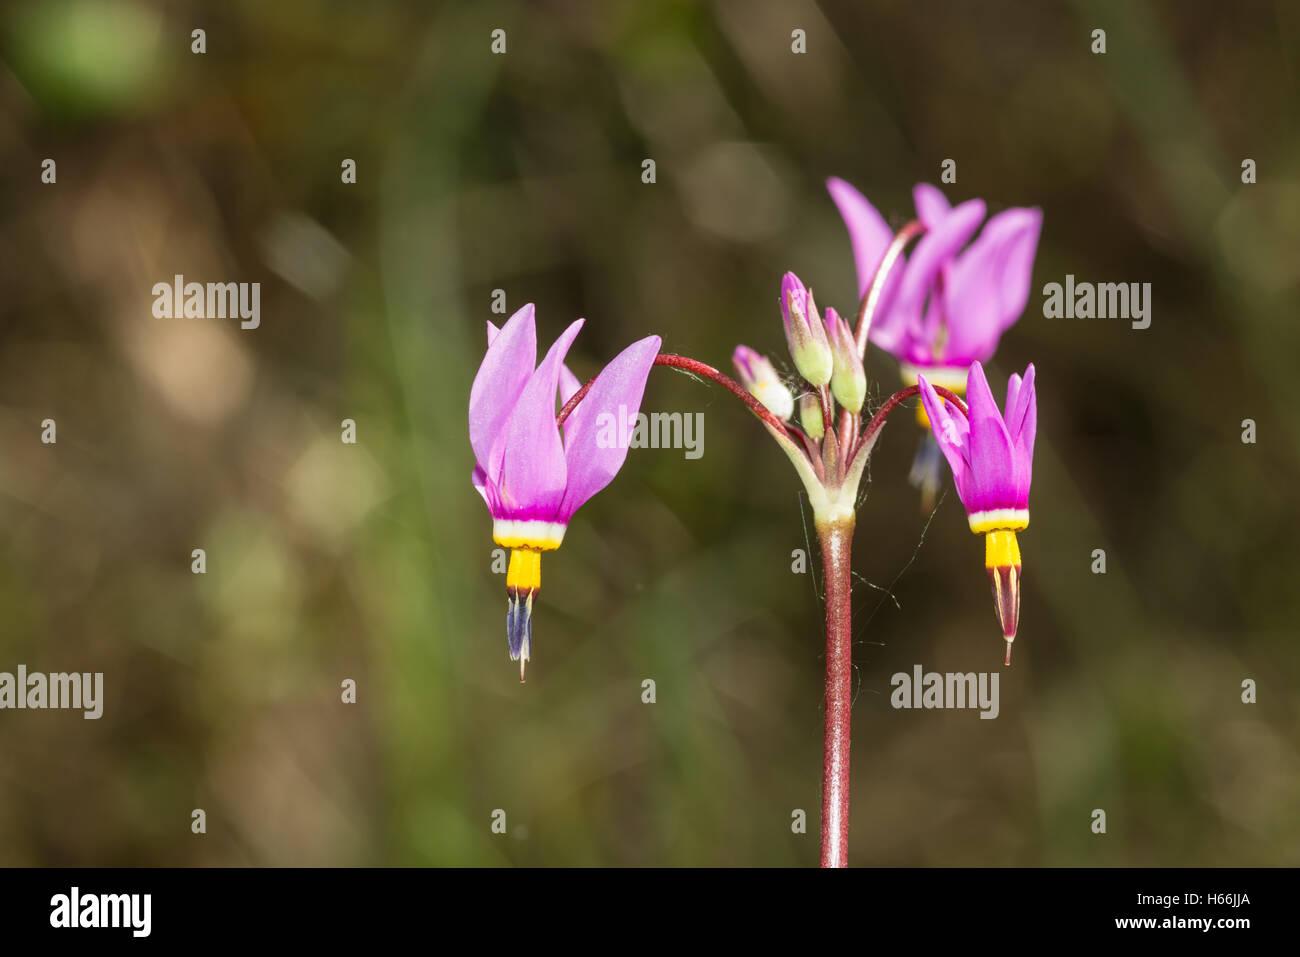 Saline shootingstar, Dodecatheon pulchellum, growing alongside a calcareous bog in Alberta, Canada - Stock Image